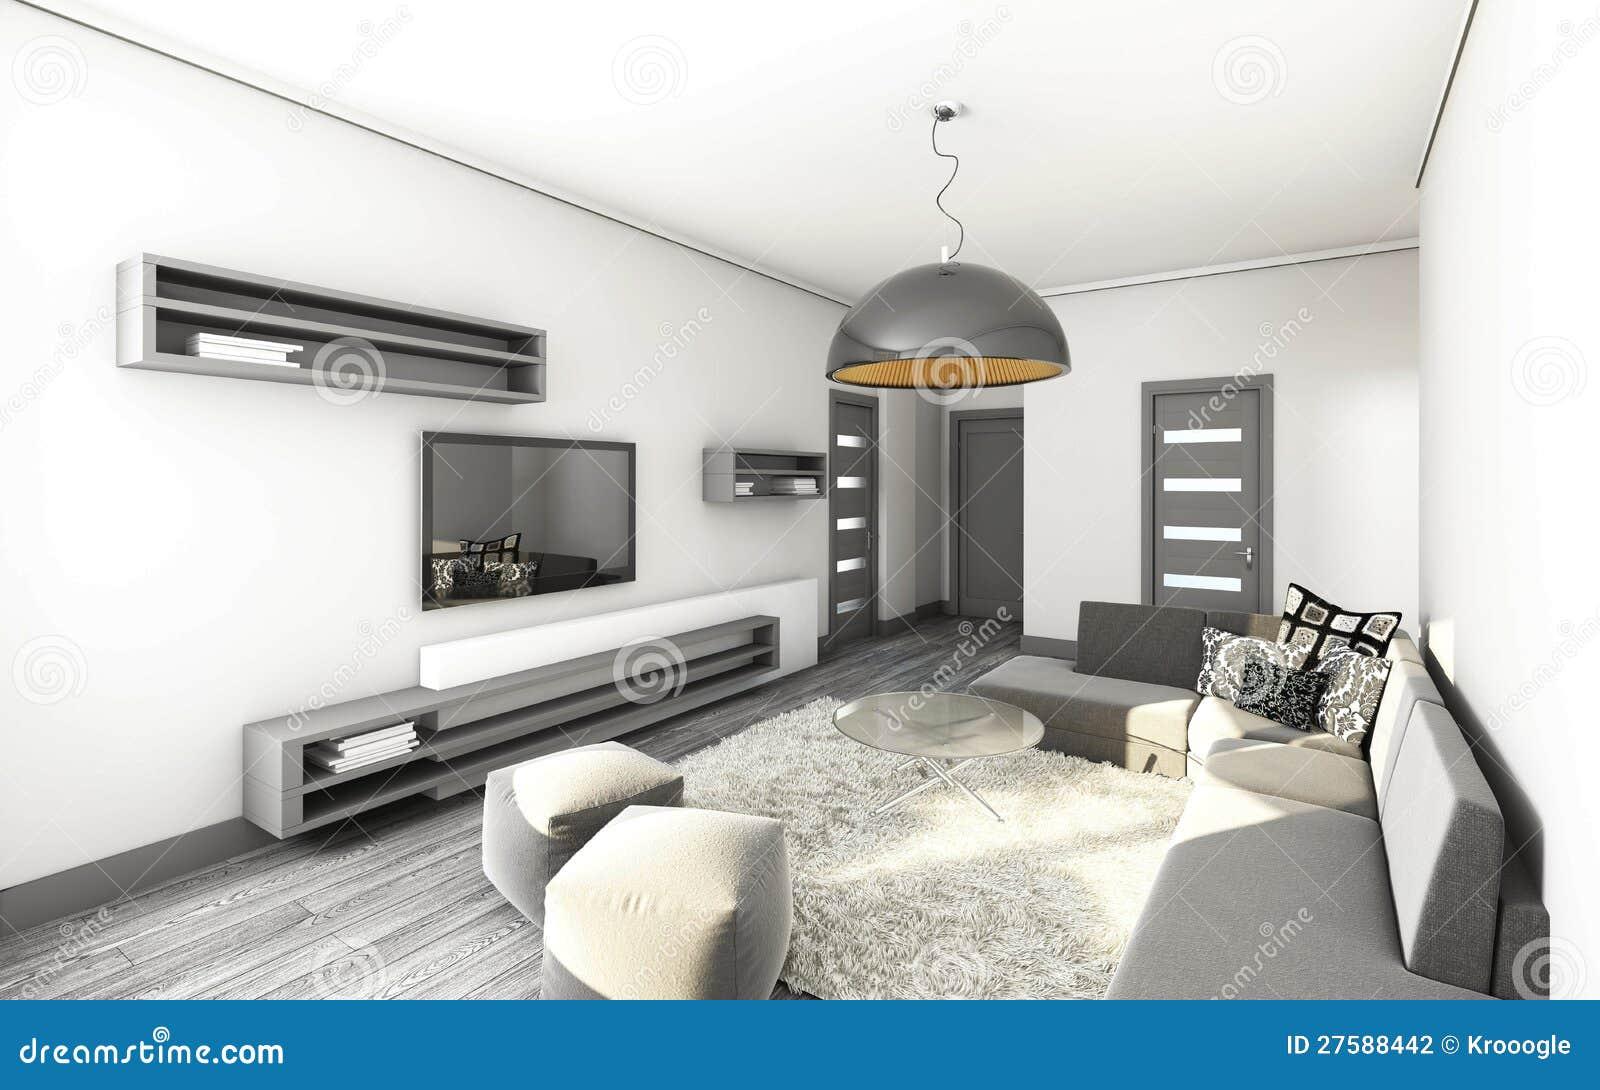 Woonkamer Zwart Grijs : Woonkamer bruin grijs wit finest interieur ideeen woonkamer zwart